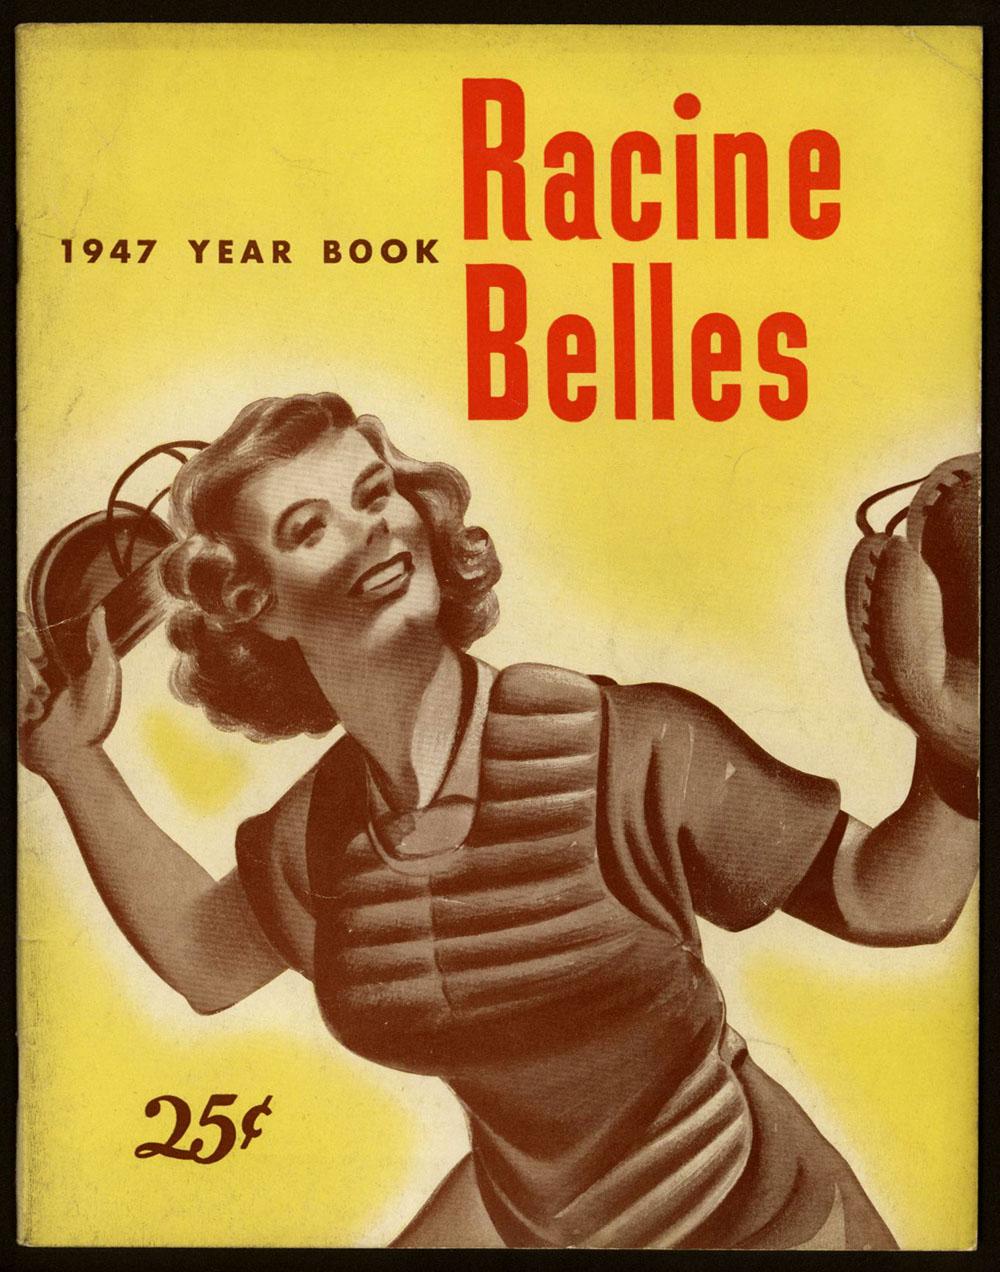 http://mlblogsourgame.files.wordpress.com/2014/03/1947-racine-belles.jpg